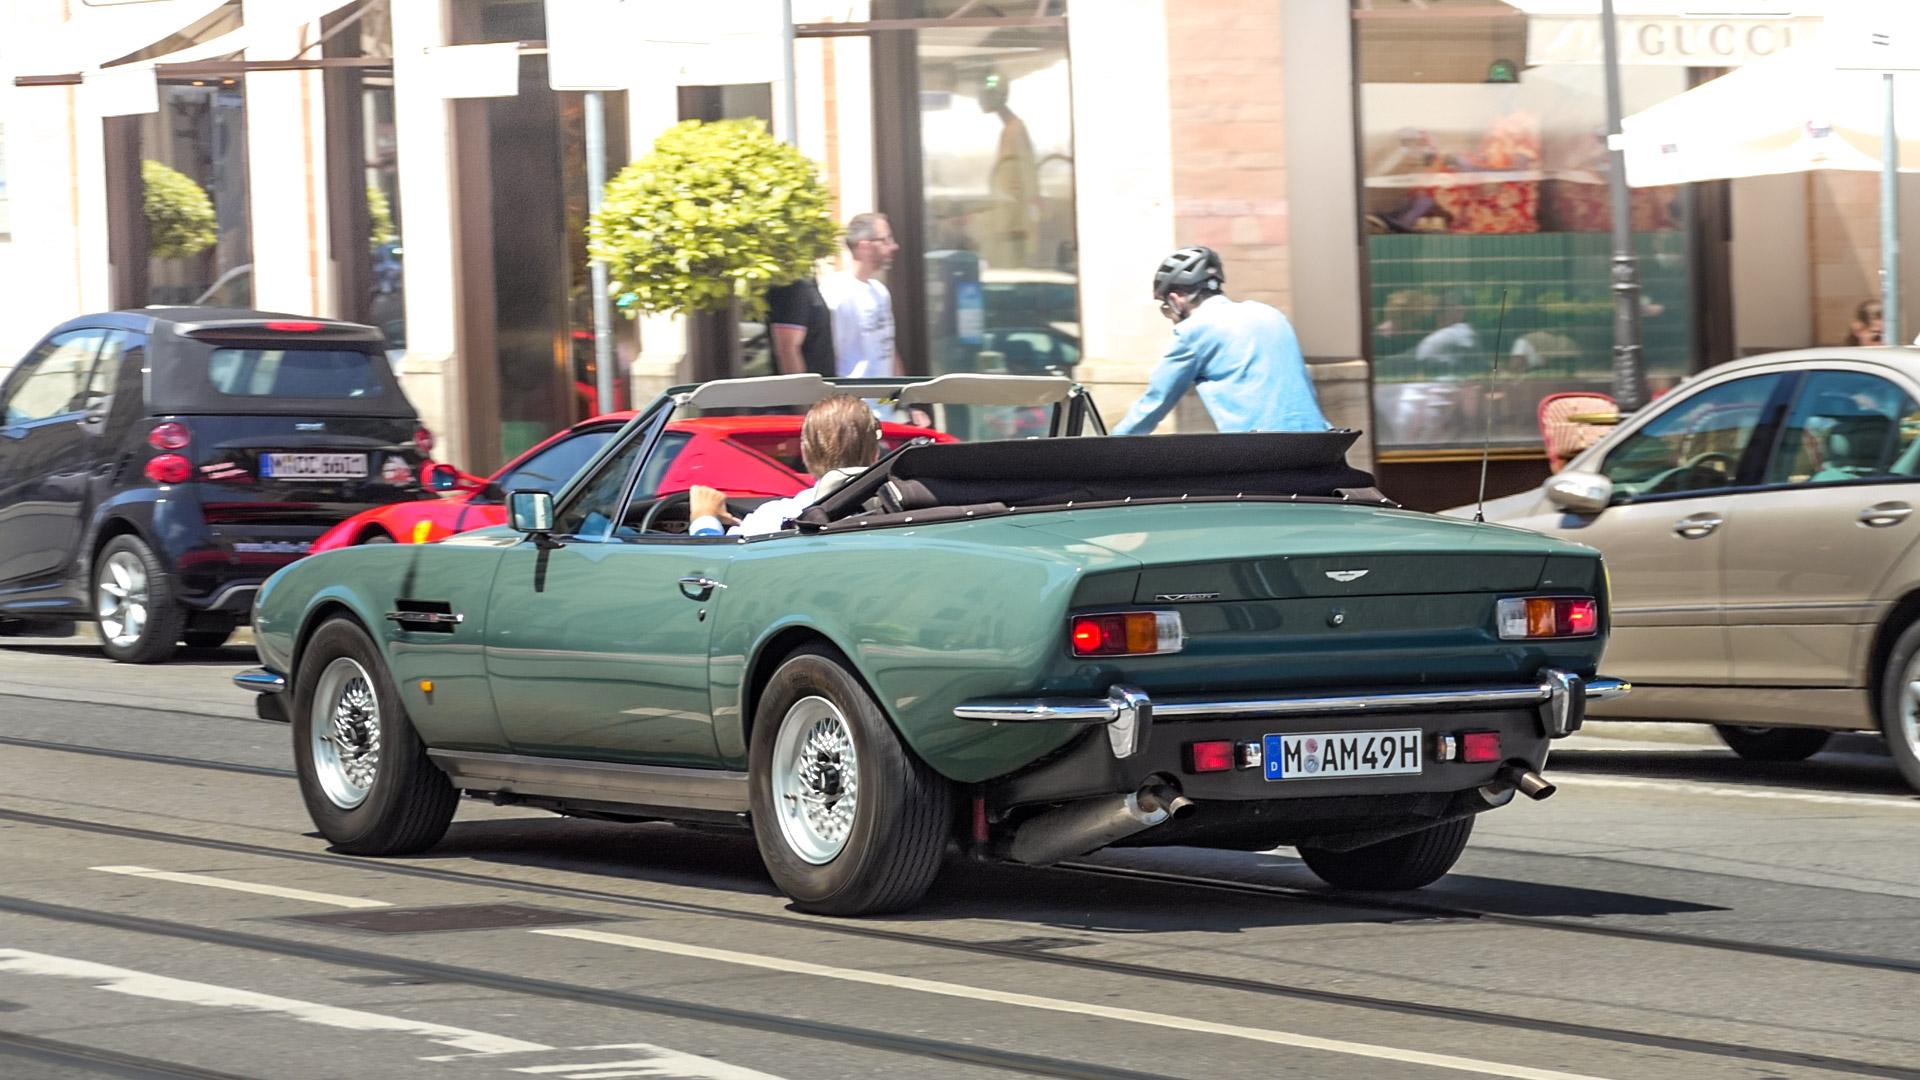 Aston Martin V8 Vantage Volante - M-AM-49H